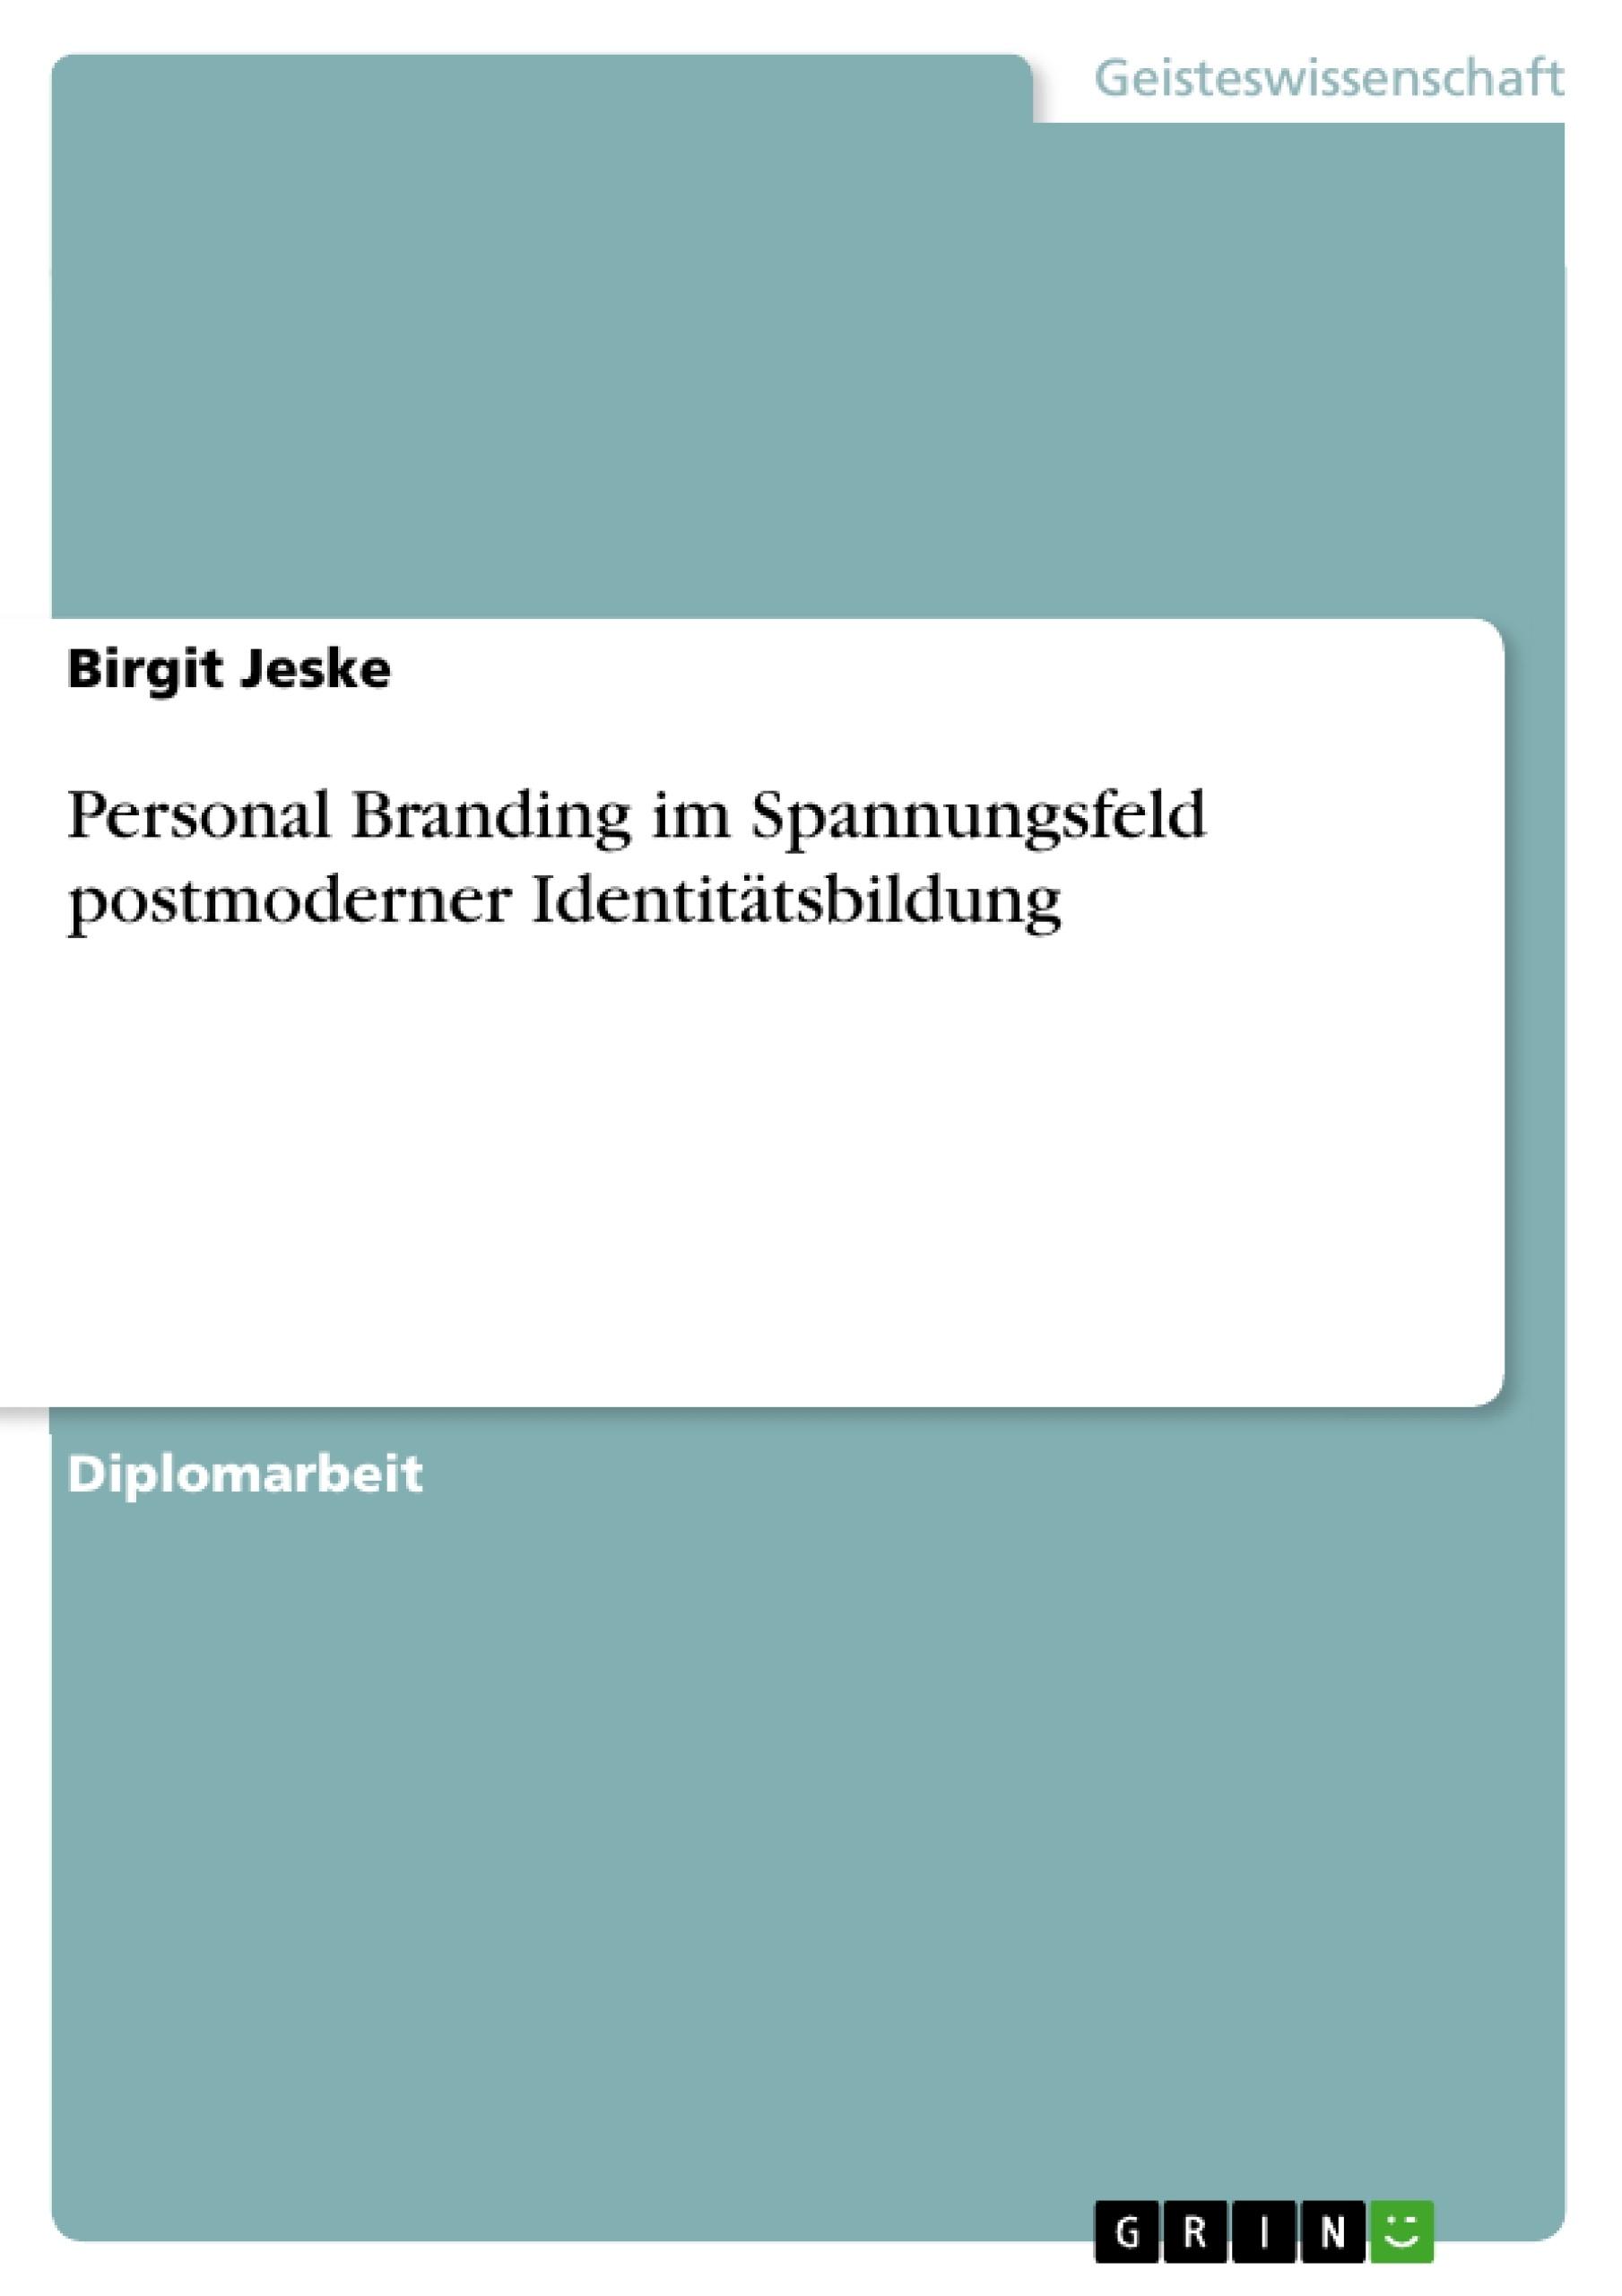 Titel: Personal Branding im Spannungsfeld postmoderner Identitätsbildung